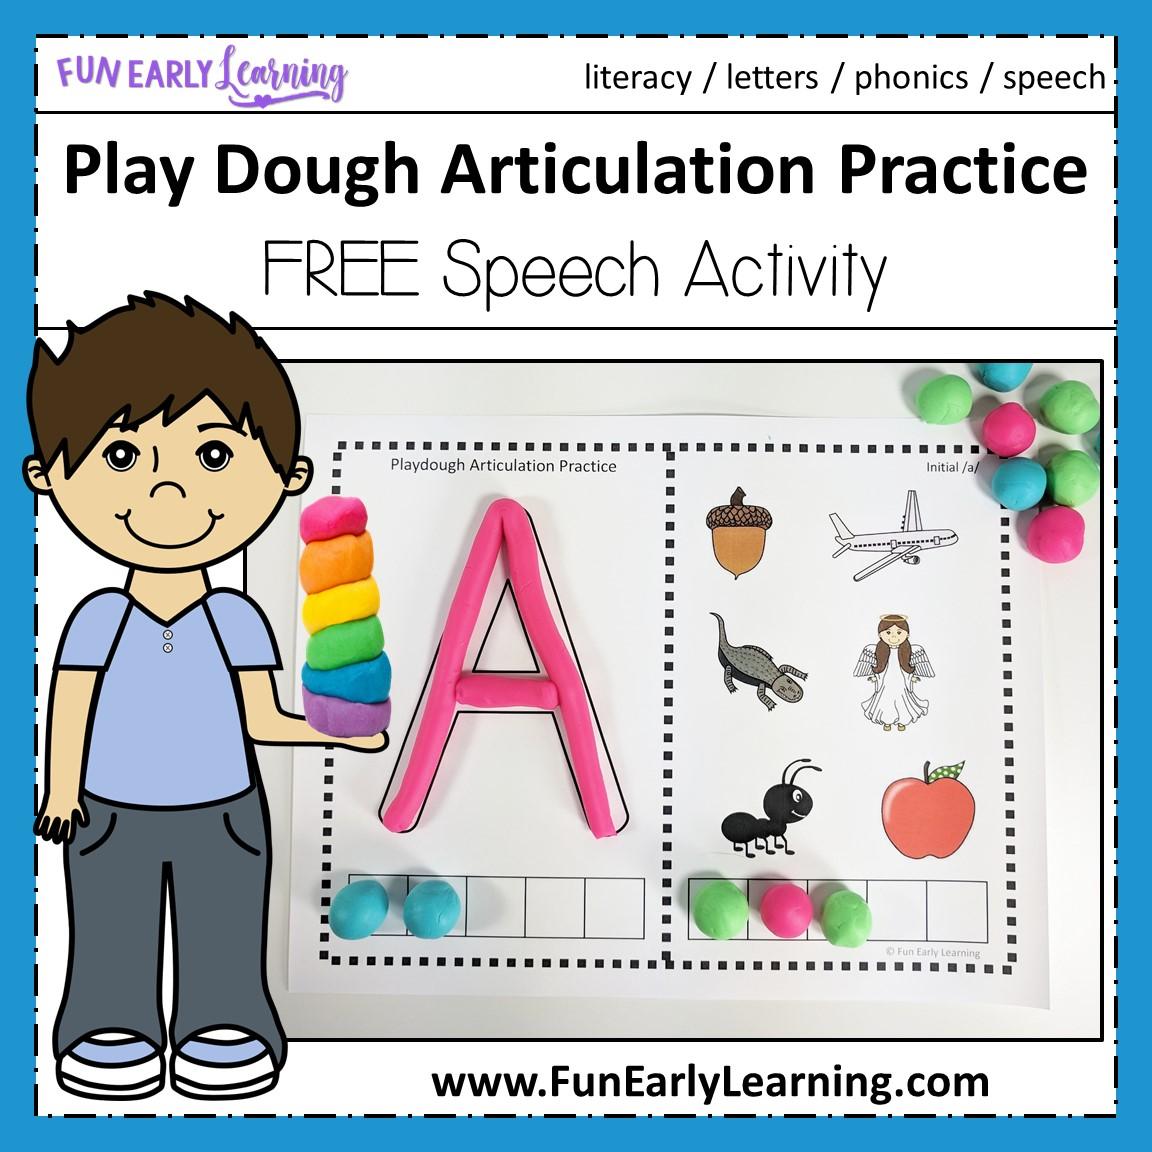 play dough articulation practice speech activity for phonics and speech